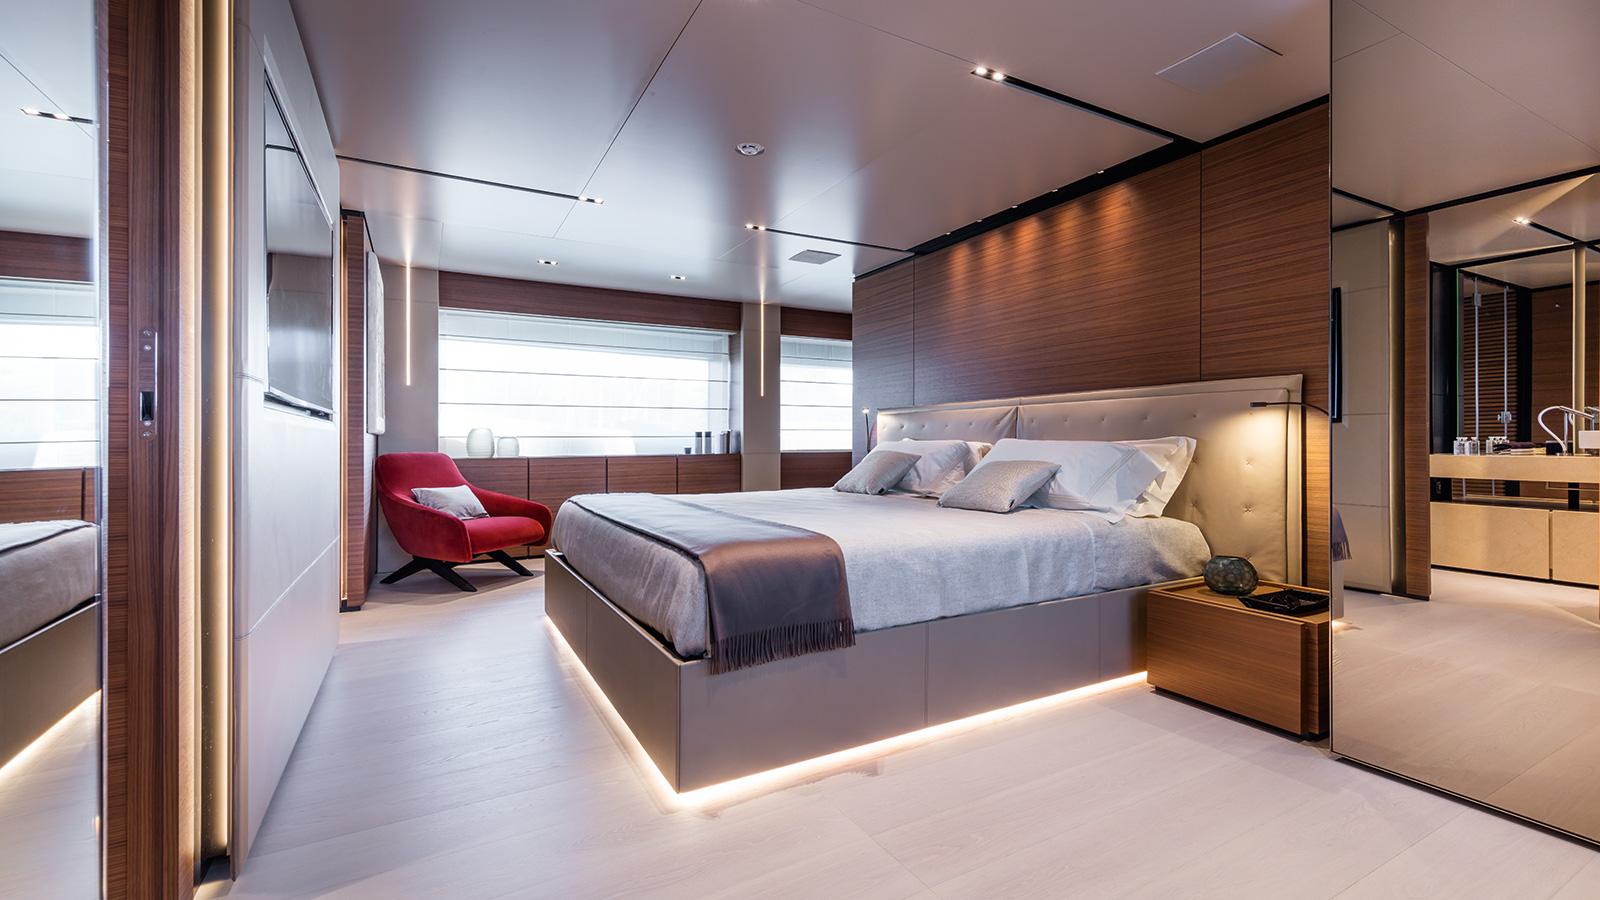 the-owners-cabin-of-the-ferretti-custom-line-motor-yacht-telli-credit-alberto-cocchi